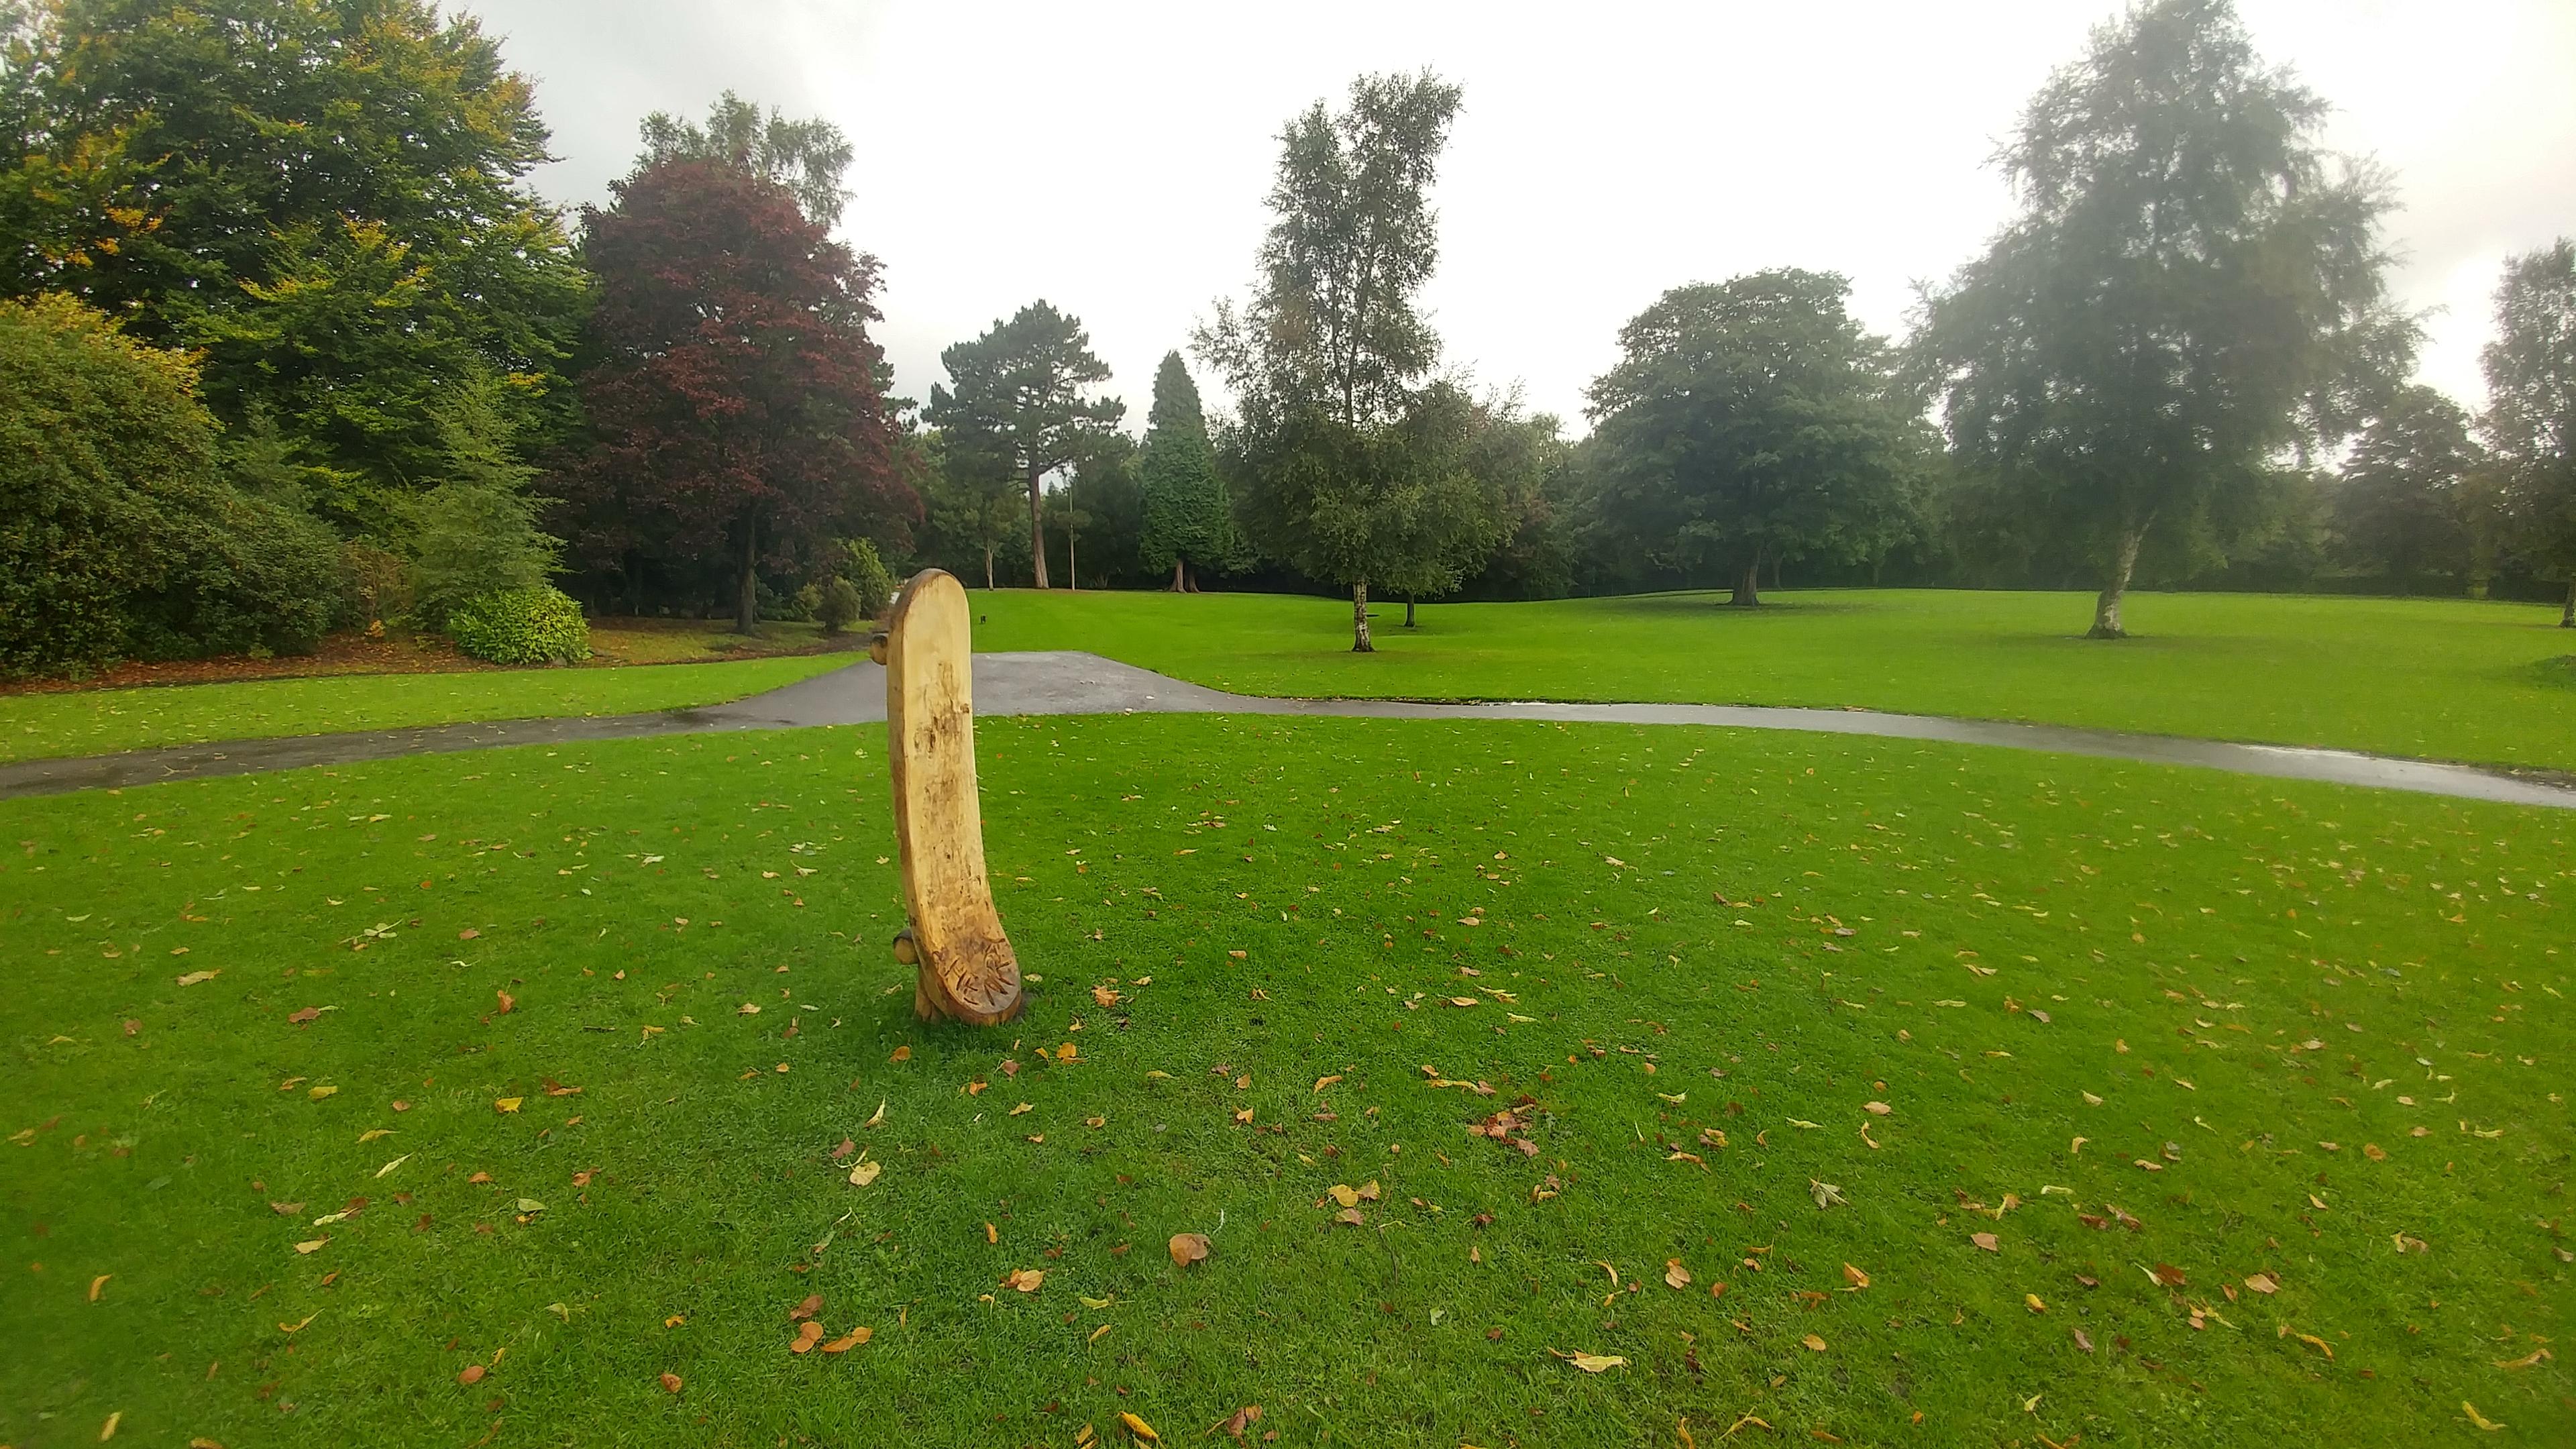 Skateboard Sculpture, West Park